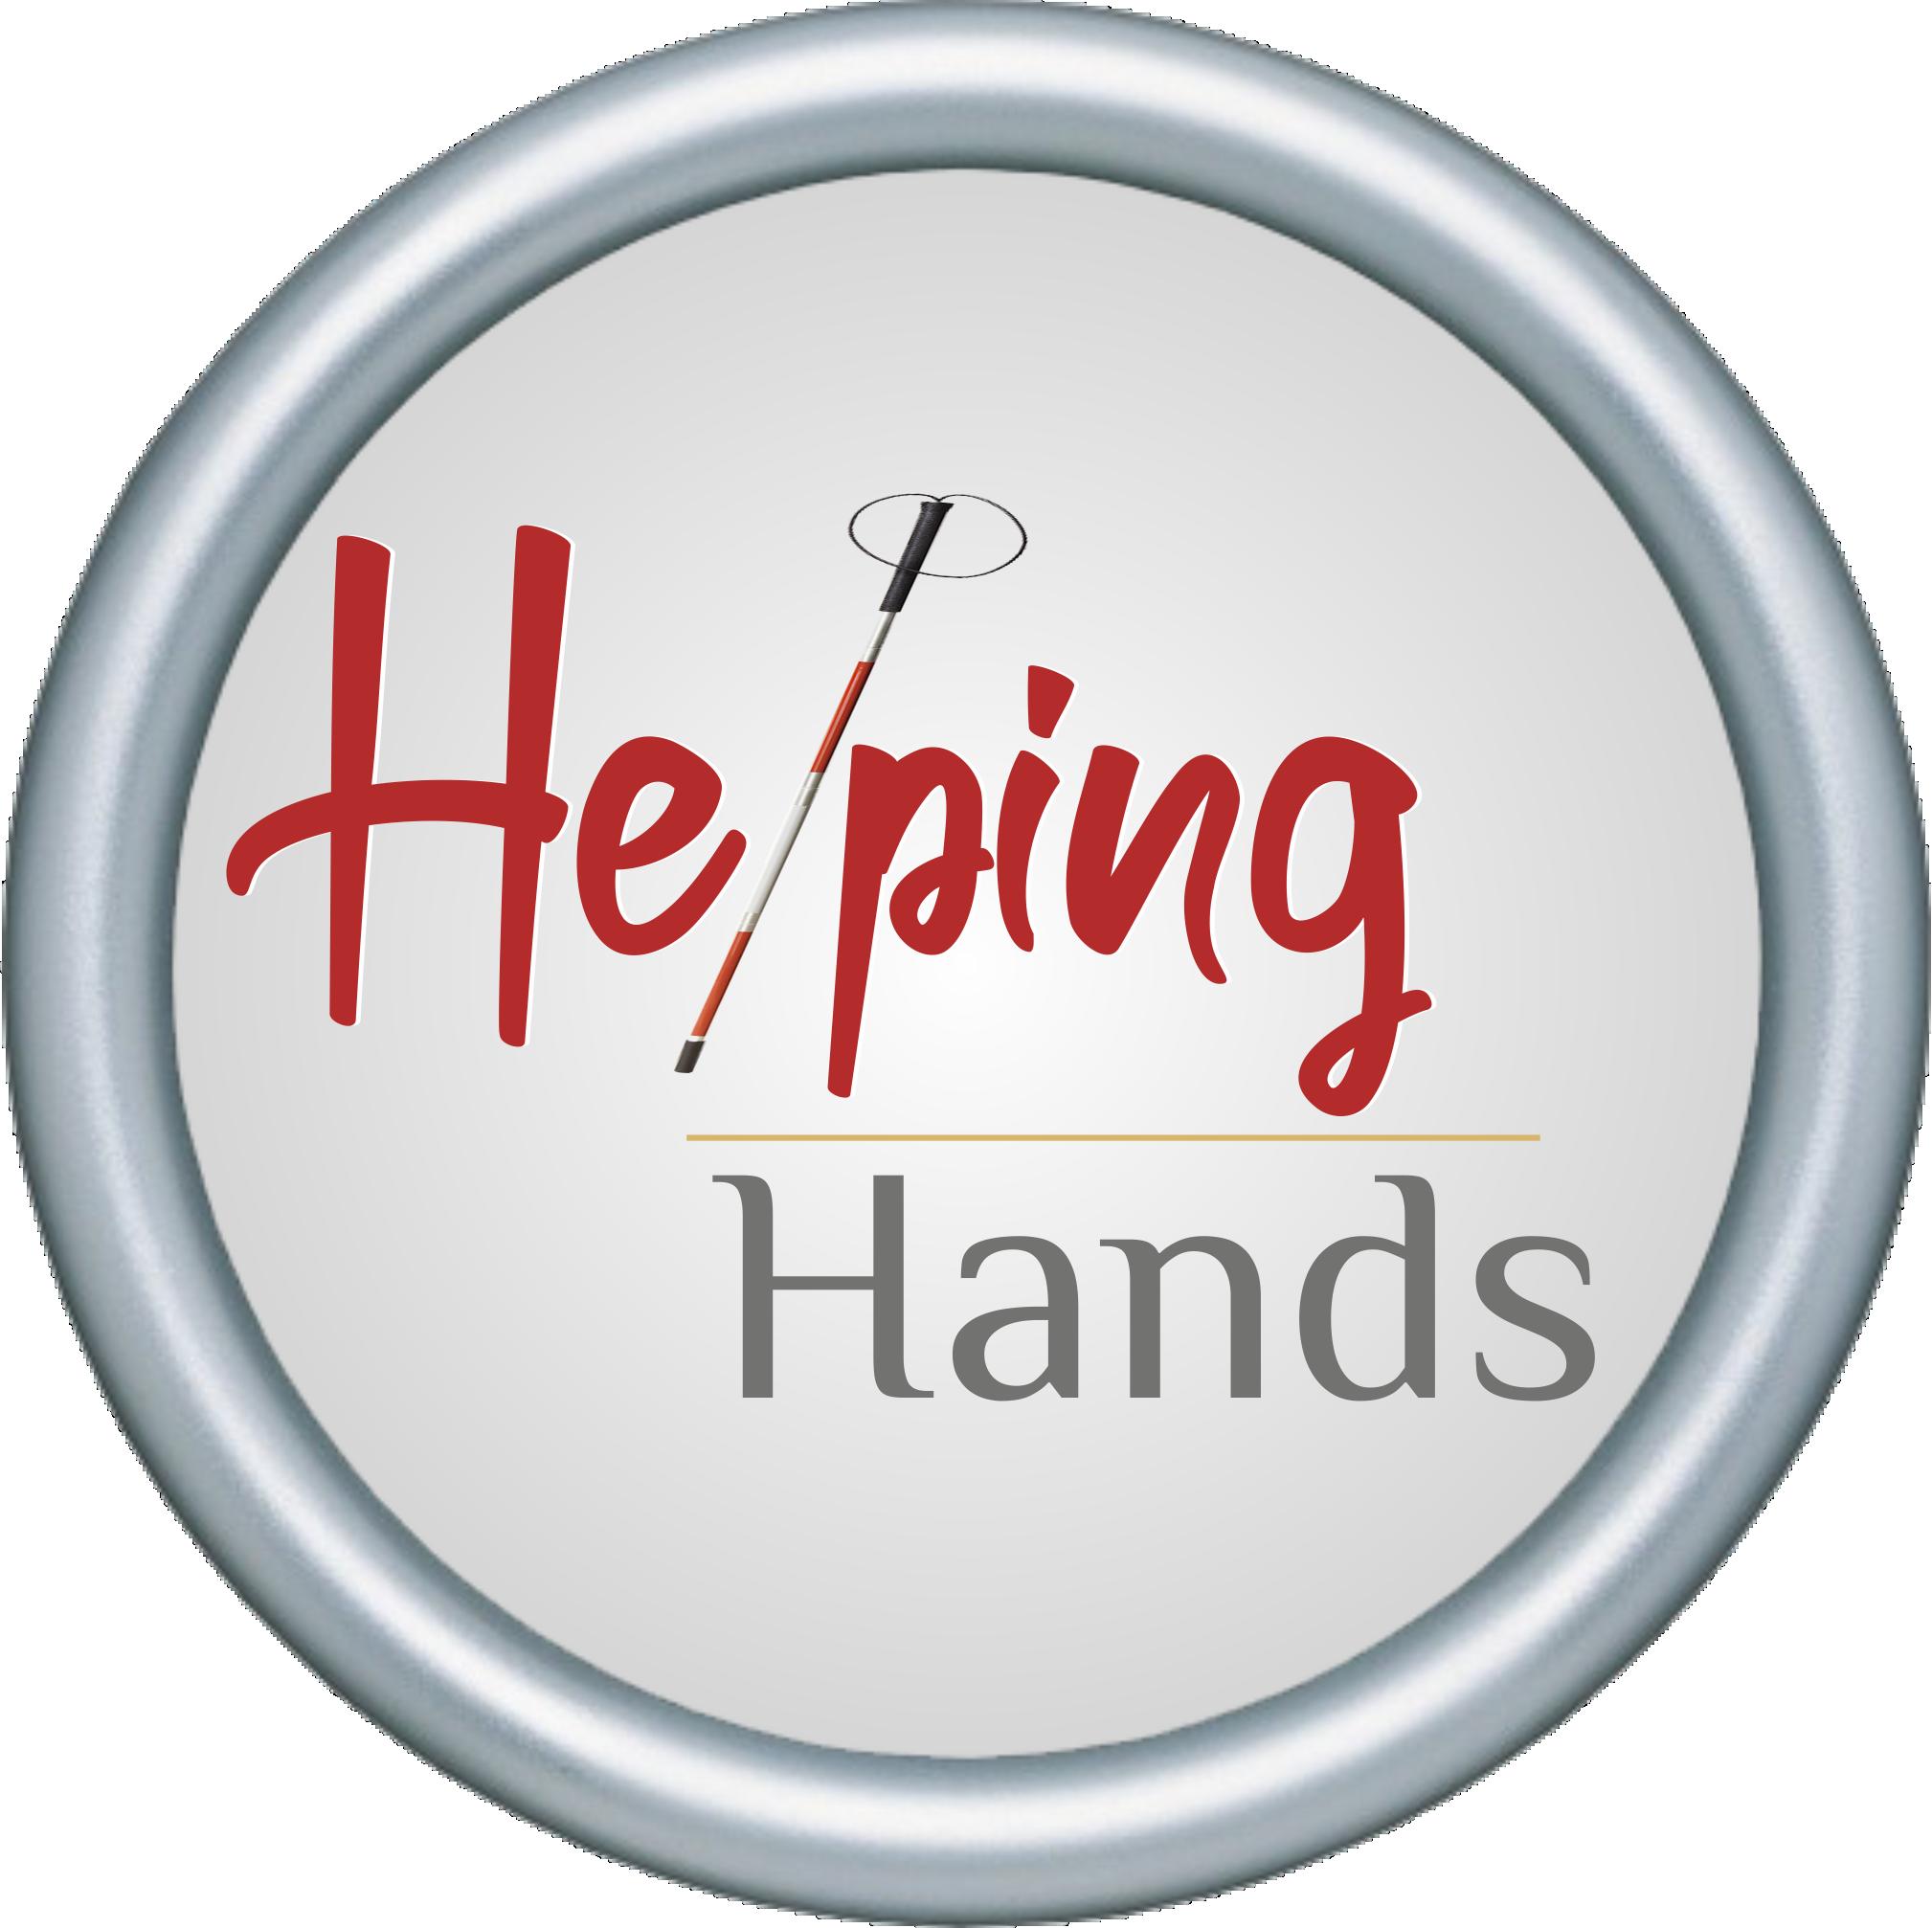 Helping hands logo